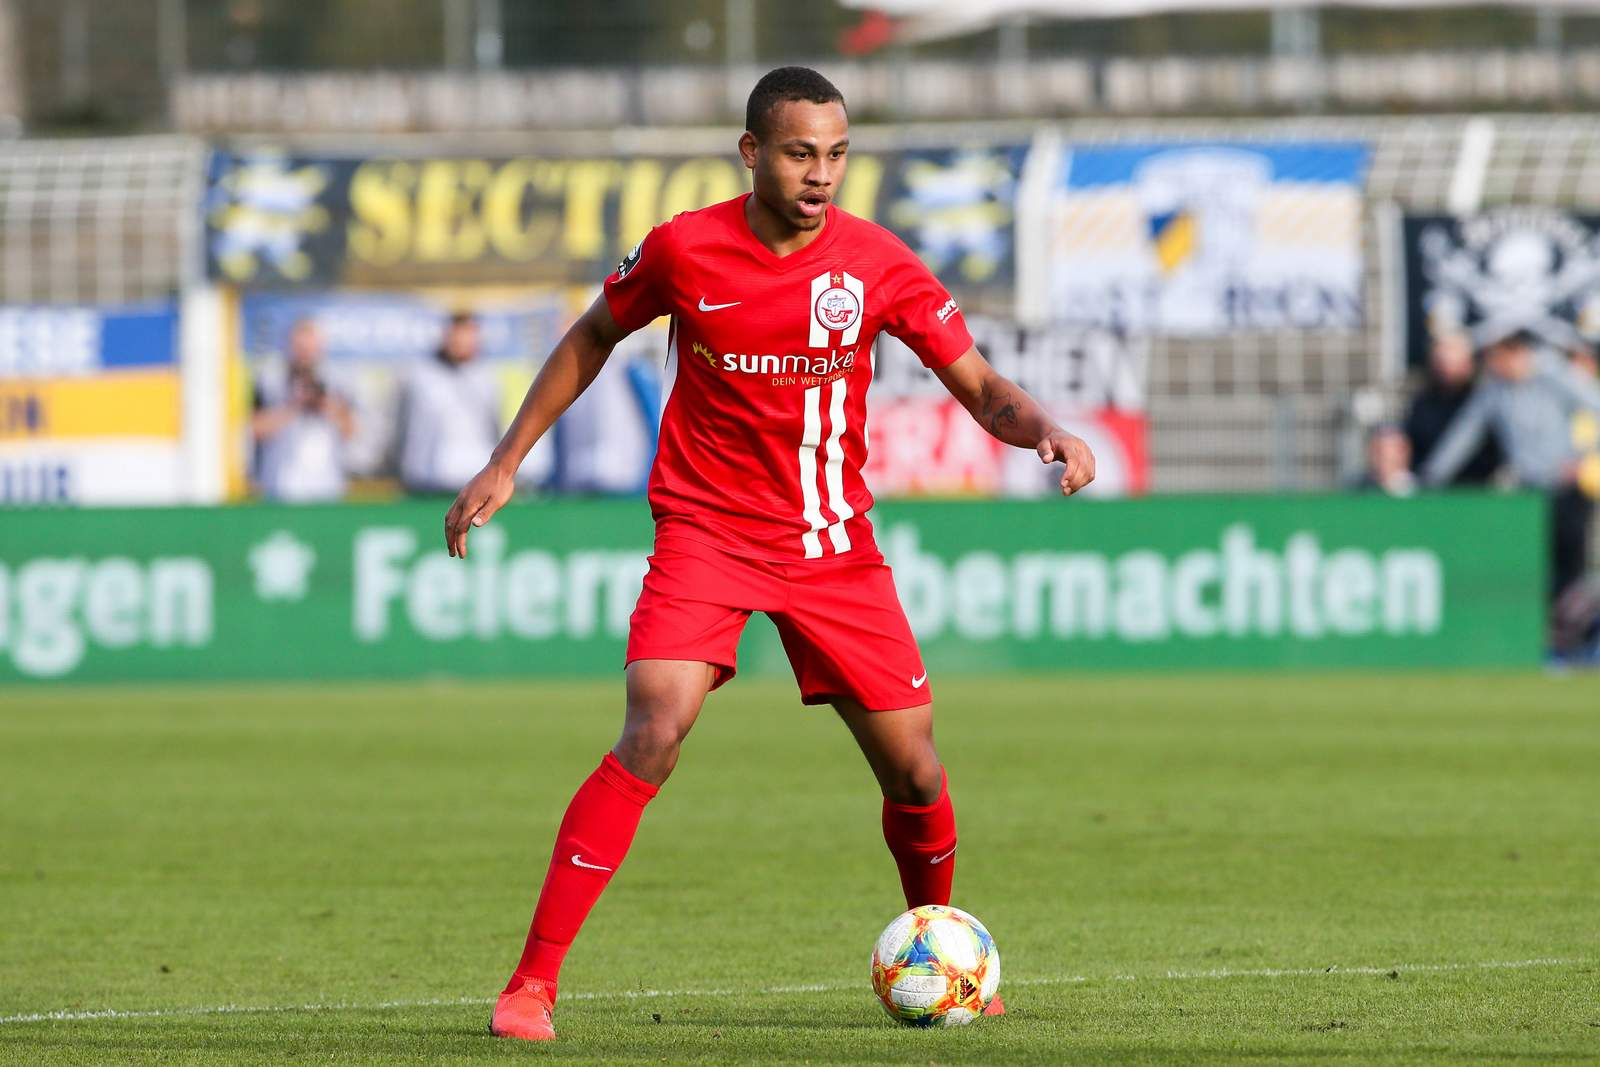 Nikolas Nartey im Spiel gegen Jena.